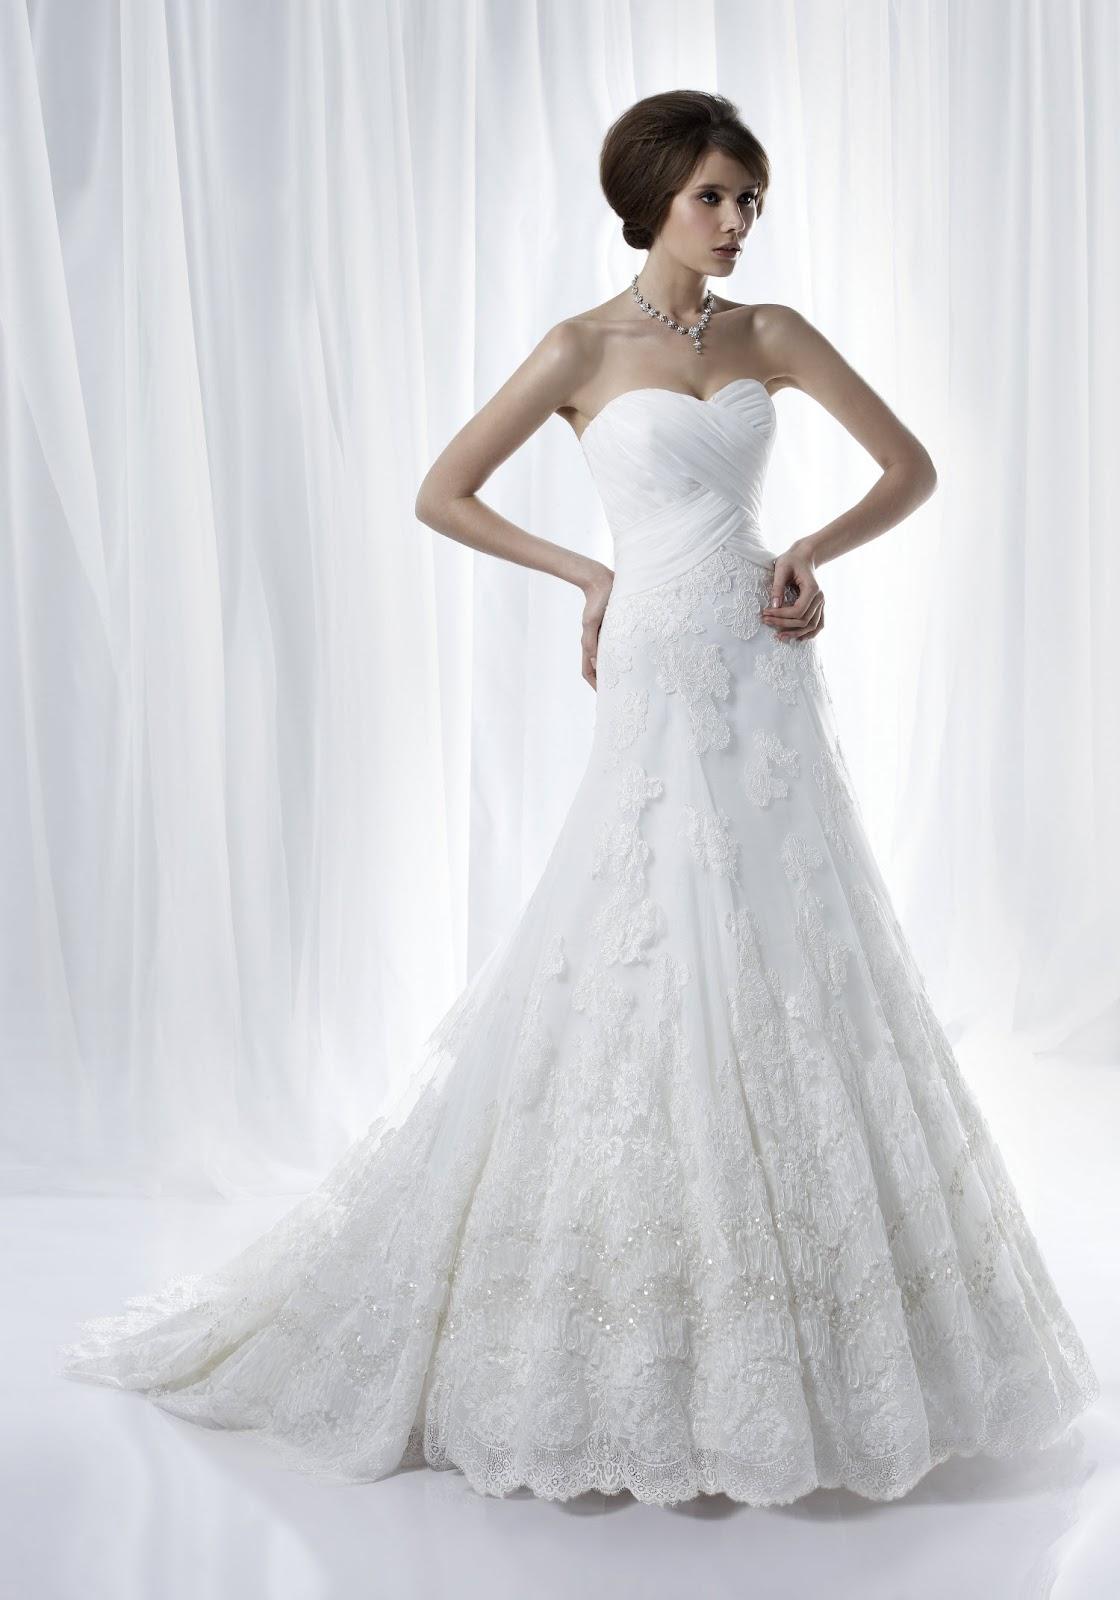 2012 Wedding Trends | Happily Ever Borrowed